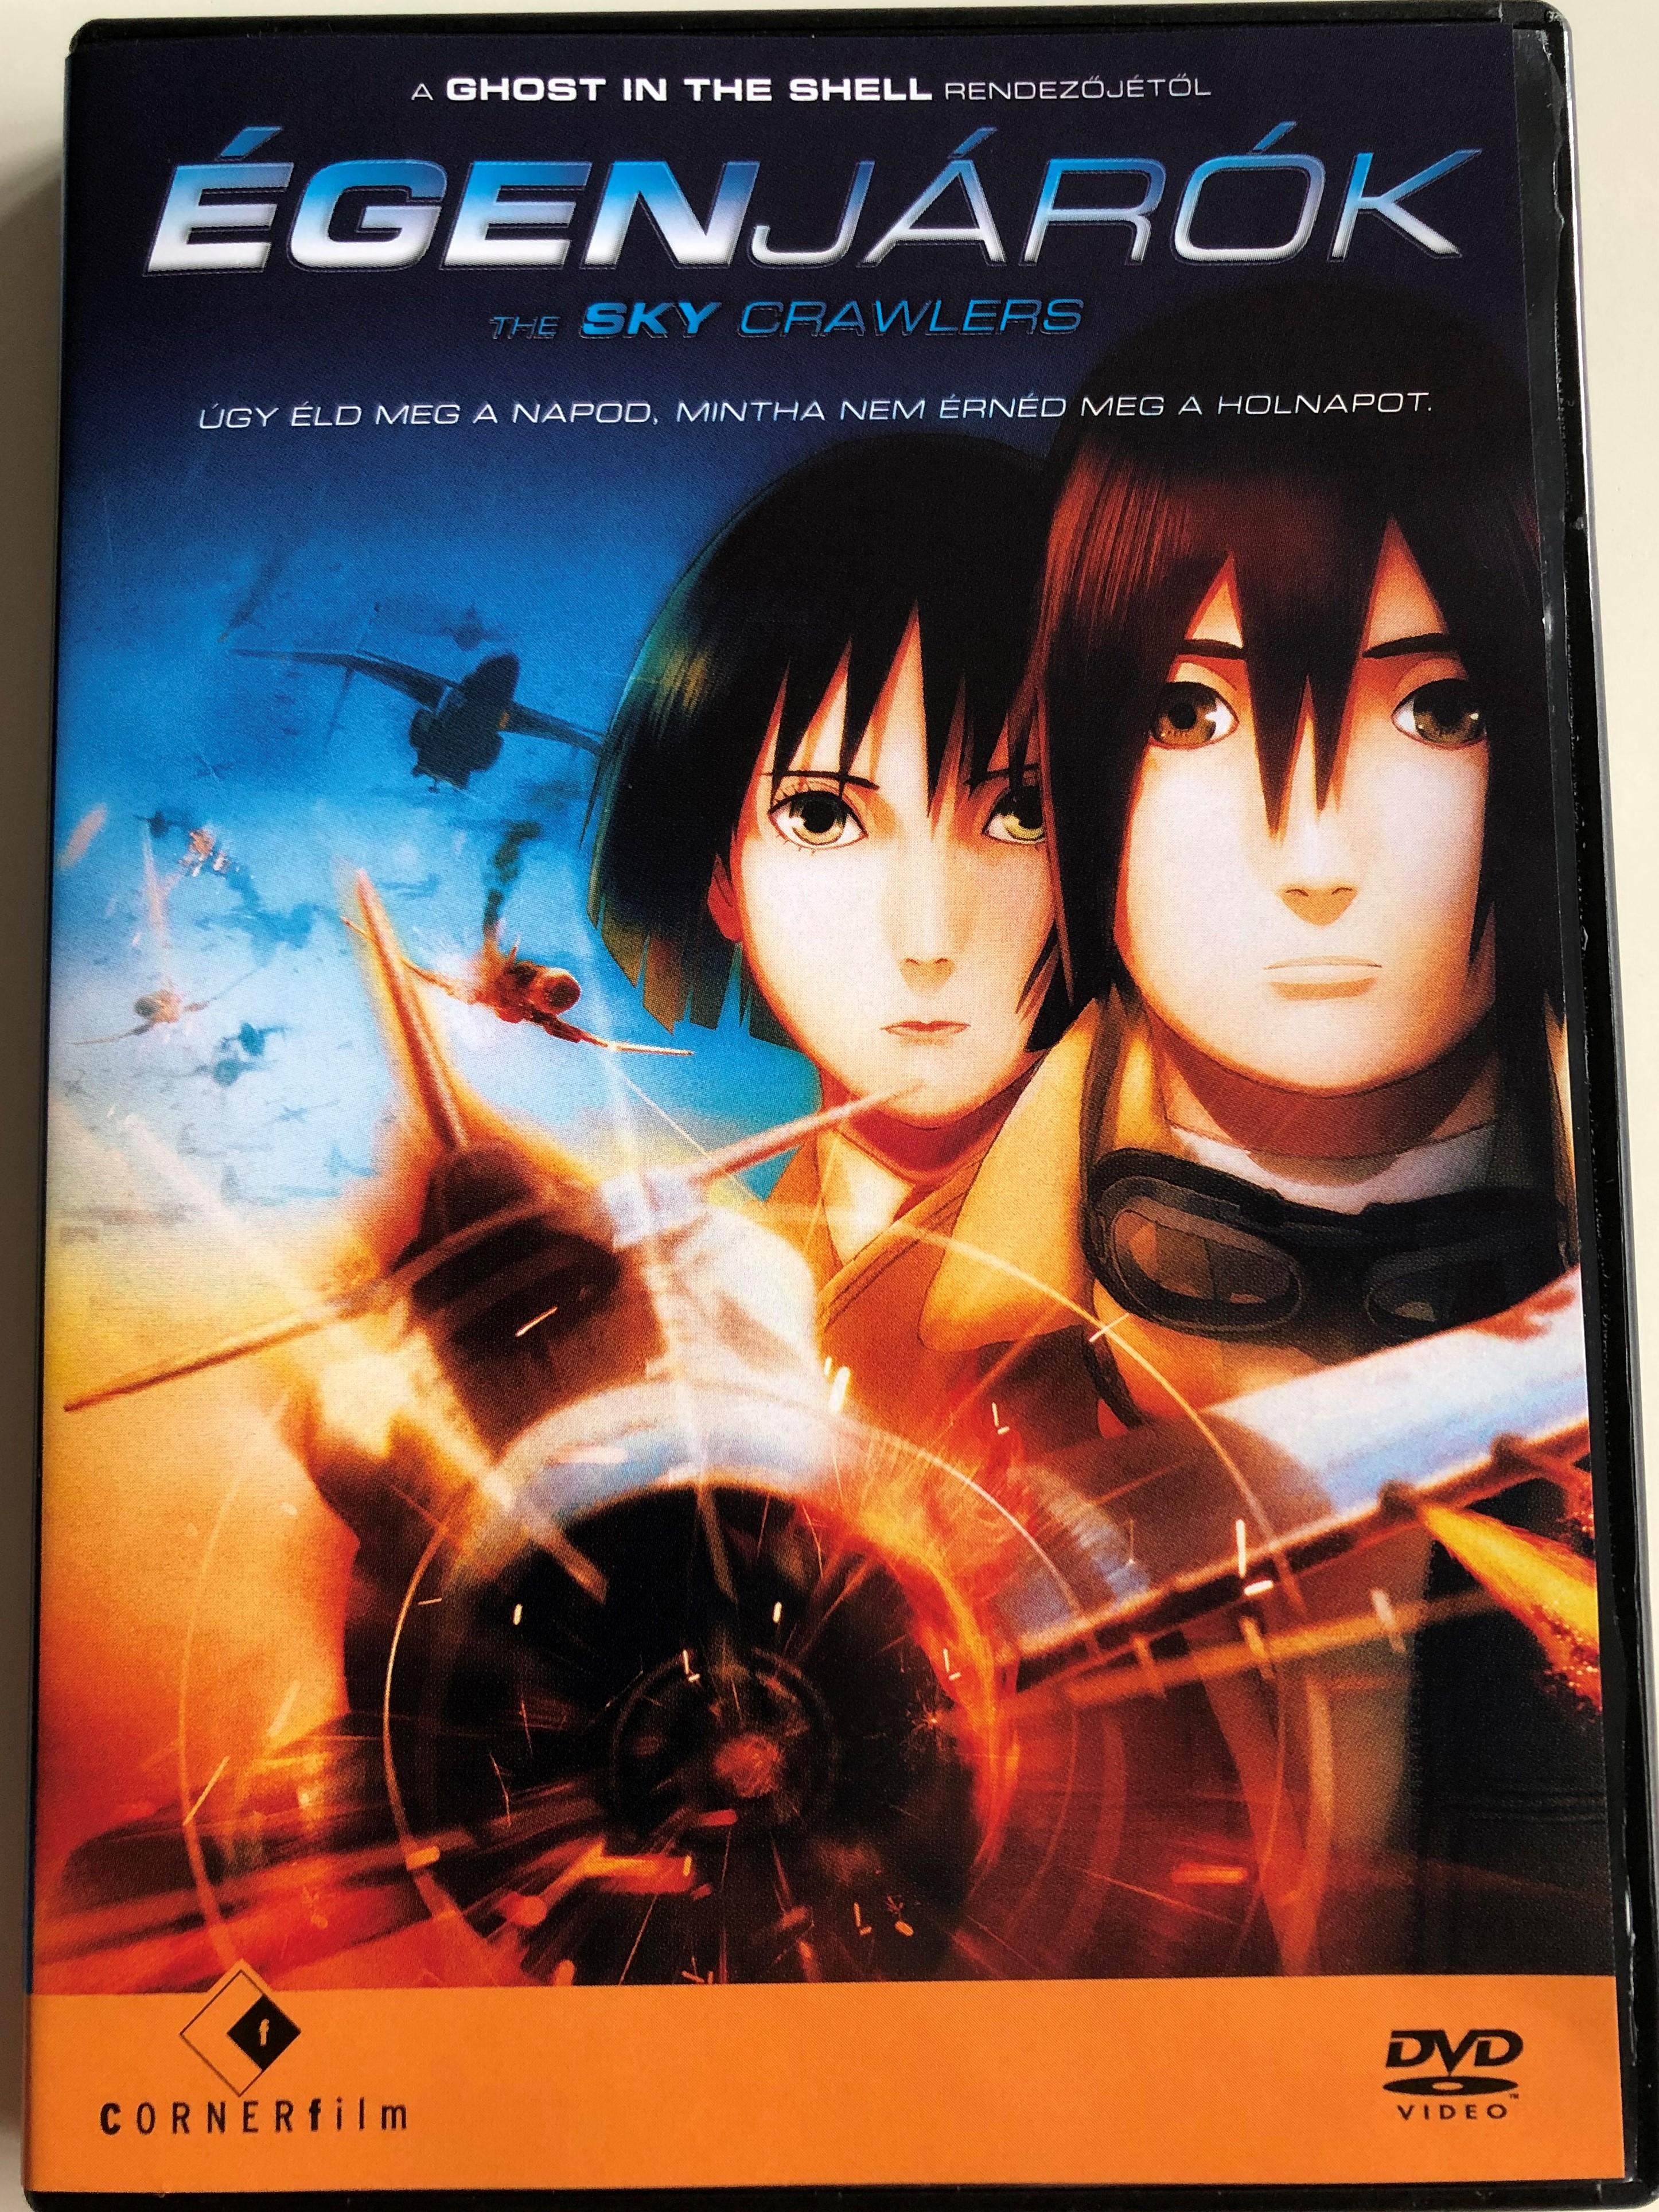 -the-sky-crawlers-sukai-kurora-dvd-2008-genj-r-k-directed-by-mamoru-oshii-starring-rinko-kikuchi-ryo-kase-sh-suke-tanihara-chiaki-kuriyama-1-.jpg